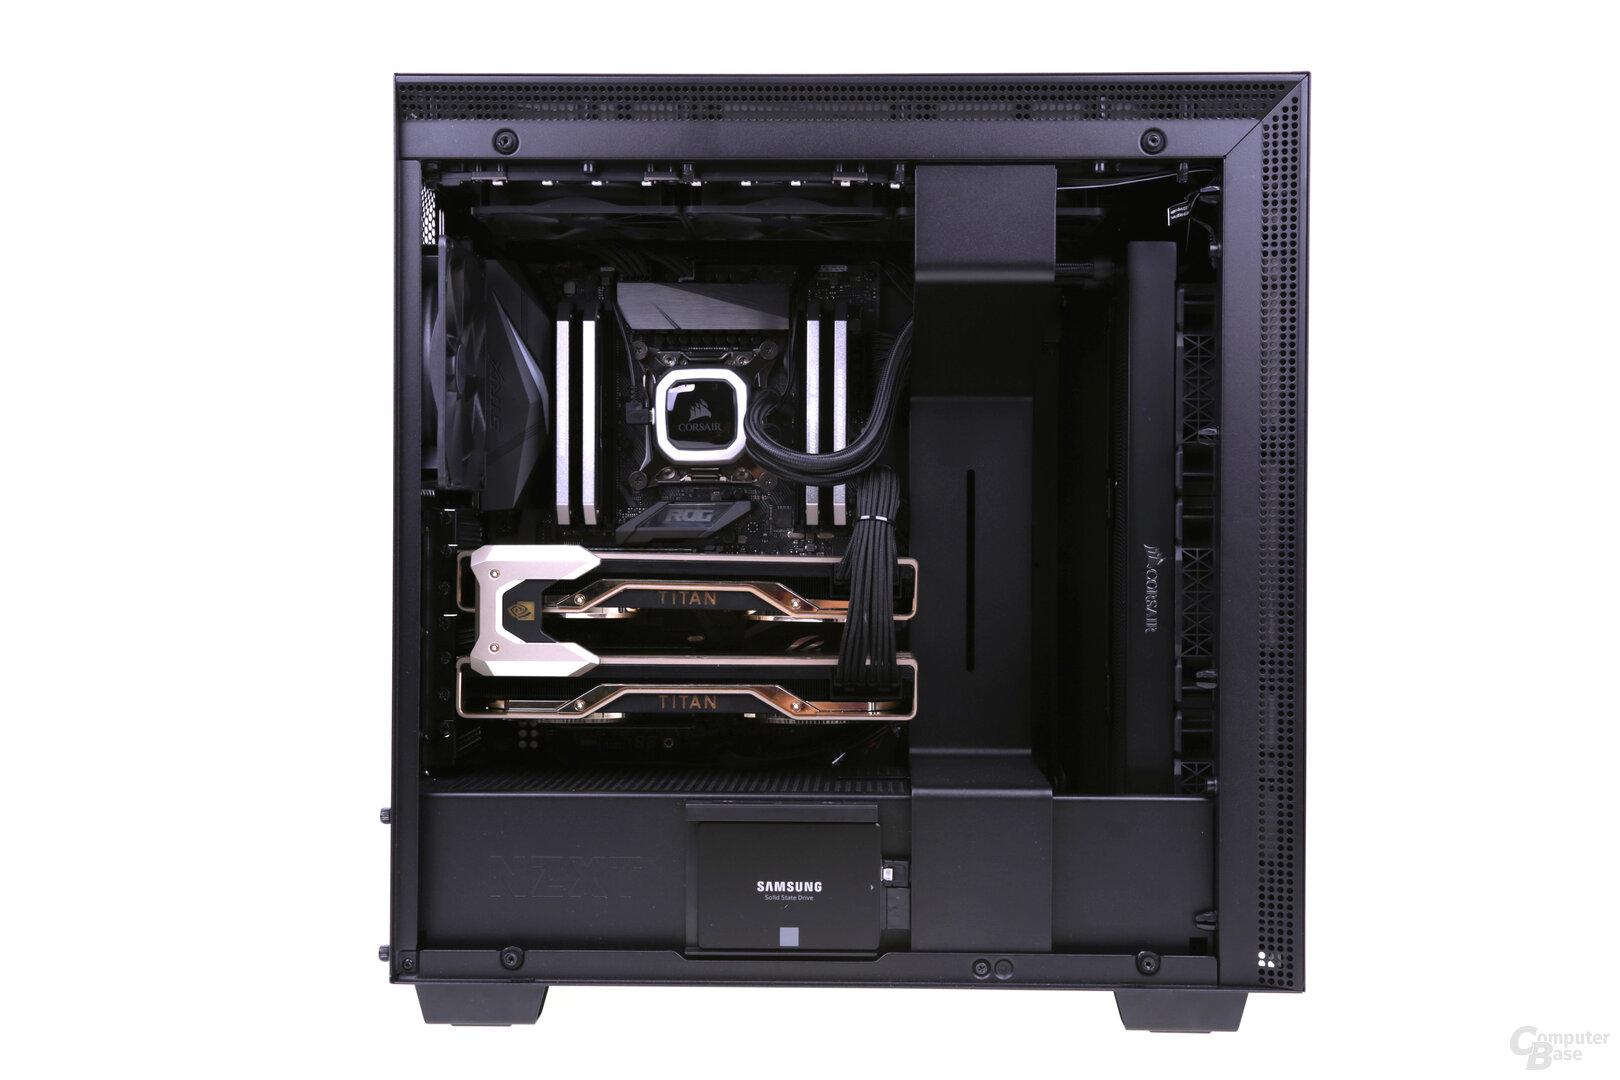 Mifcom-PC mit 2 × Titan RTX im Test